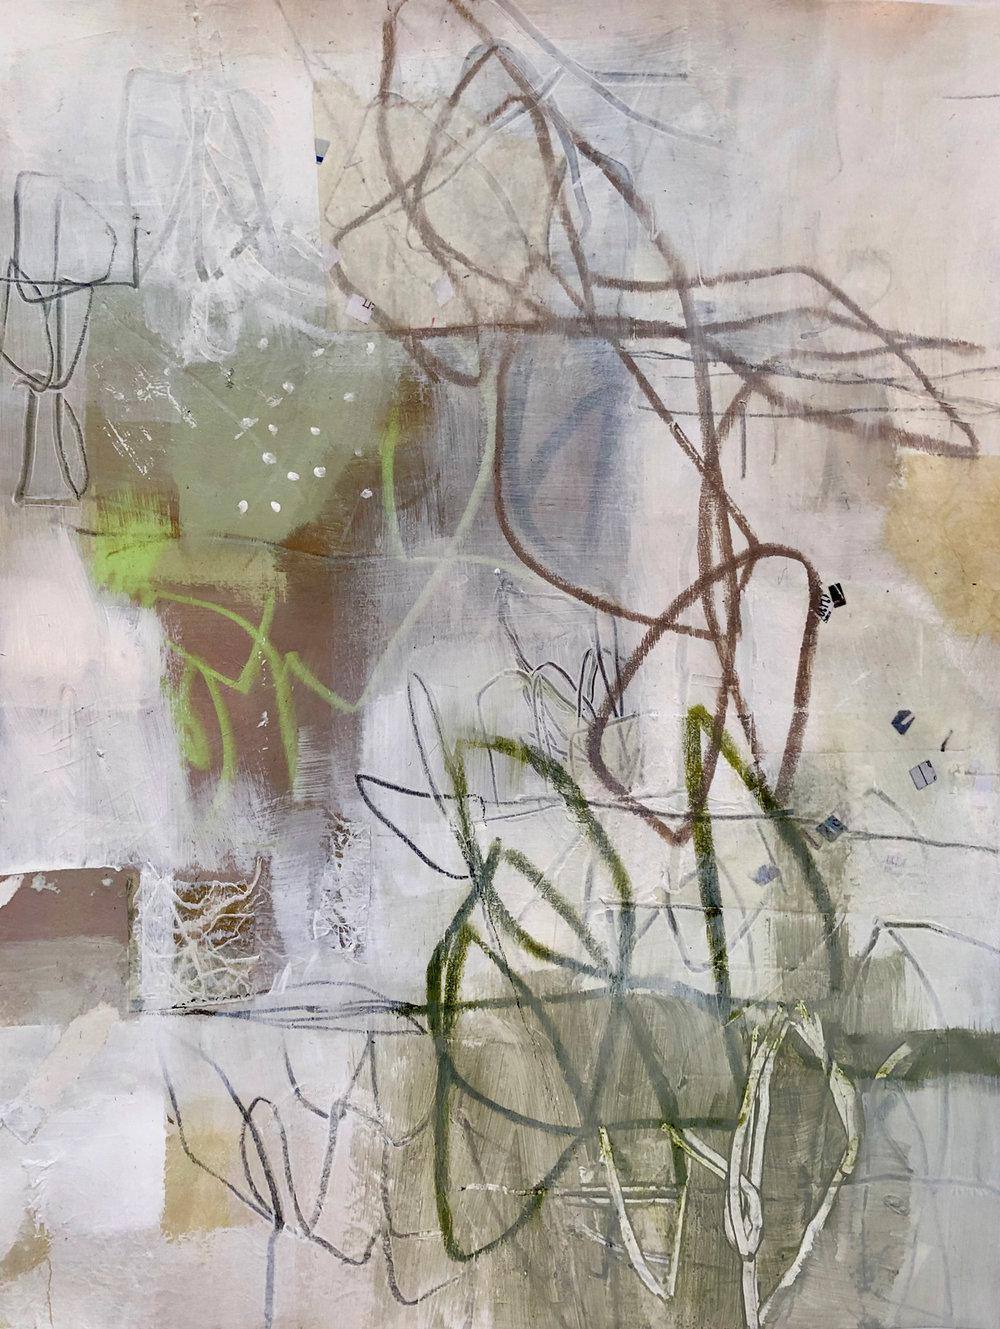 9x12 acrylic on paper